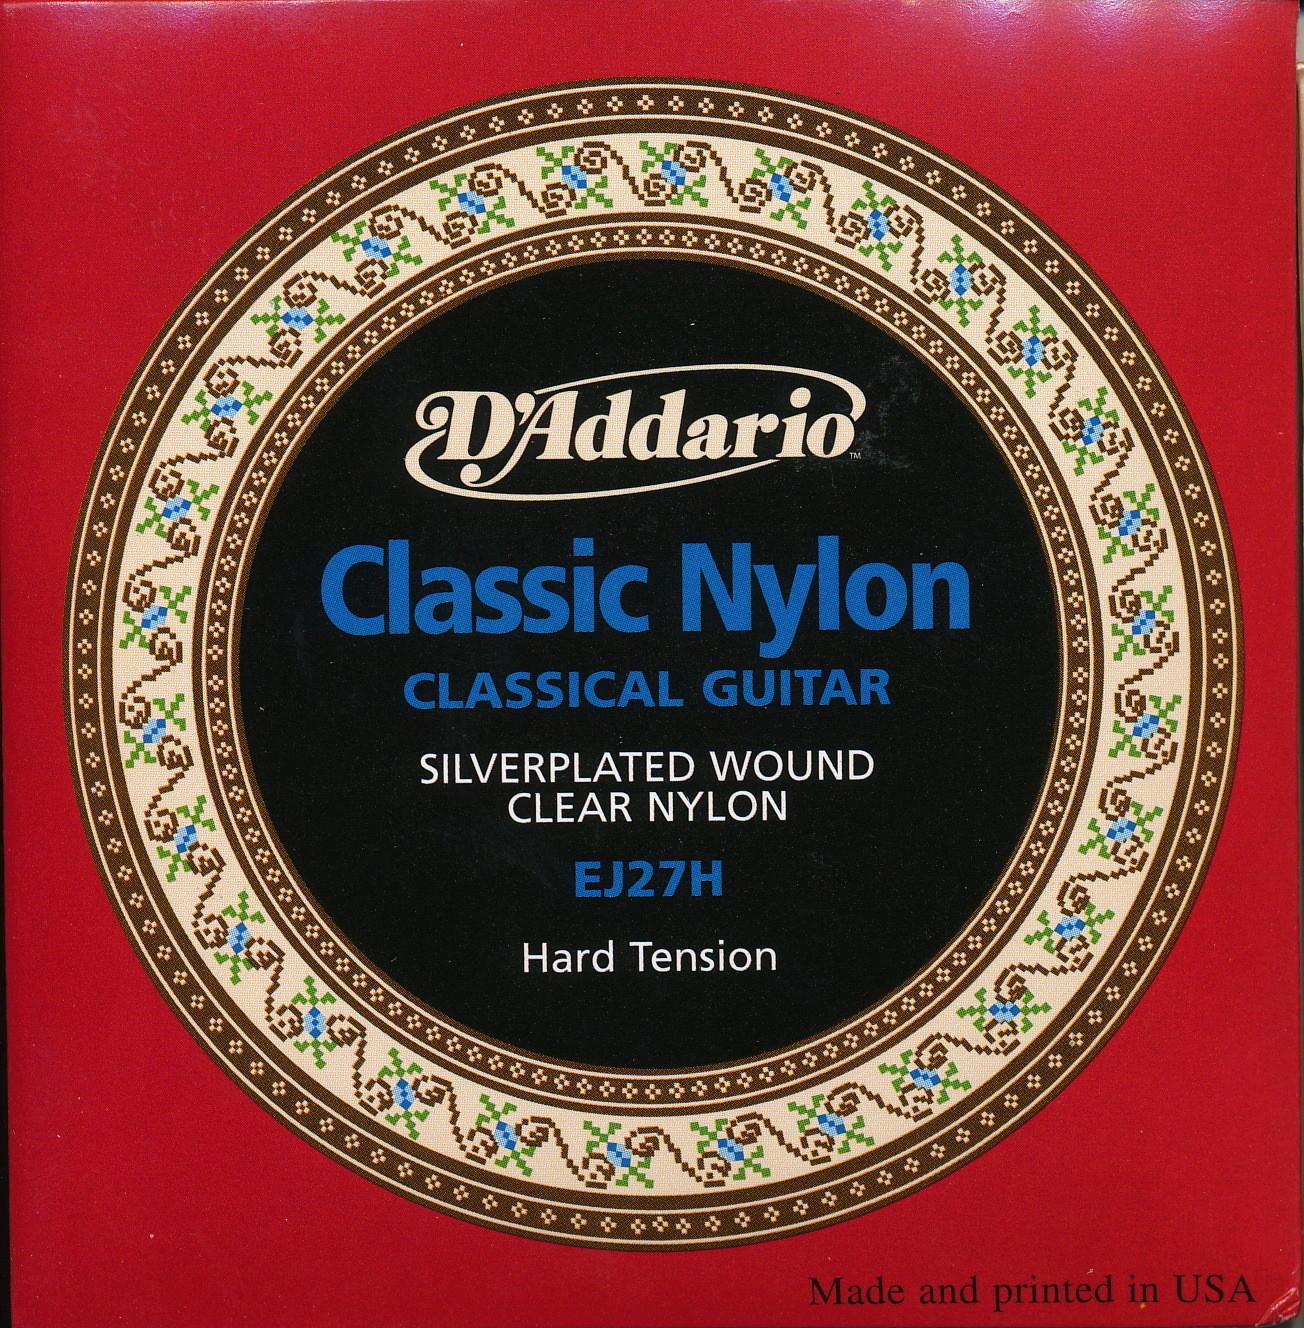 D'Addario Classic Nylon - Student Level Classical Guitar Strings